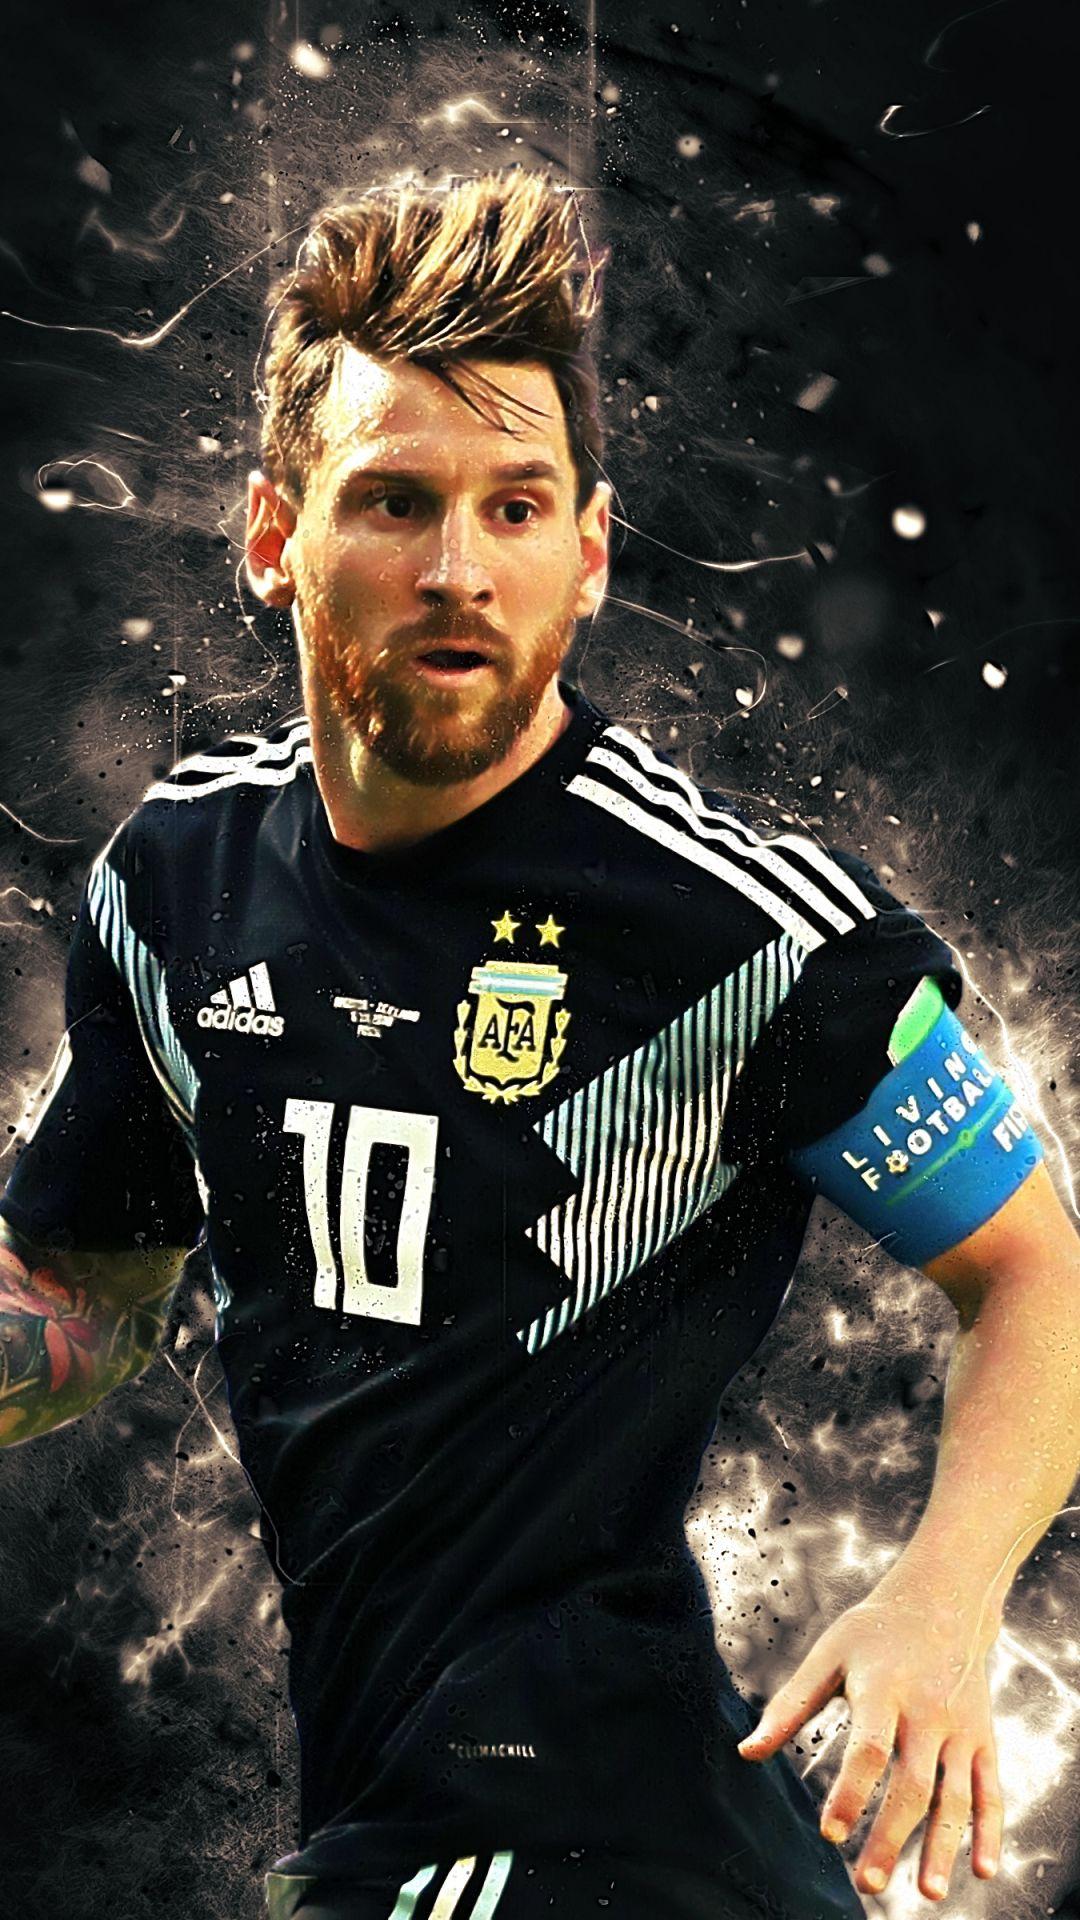 Argentina Messi Wallpaper Home Screen Lionel Messi Lionel Messi Wallpapers Messi